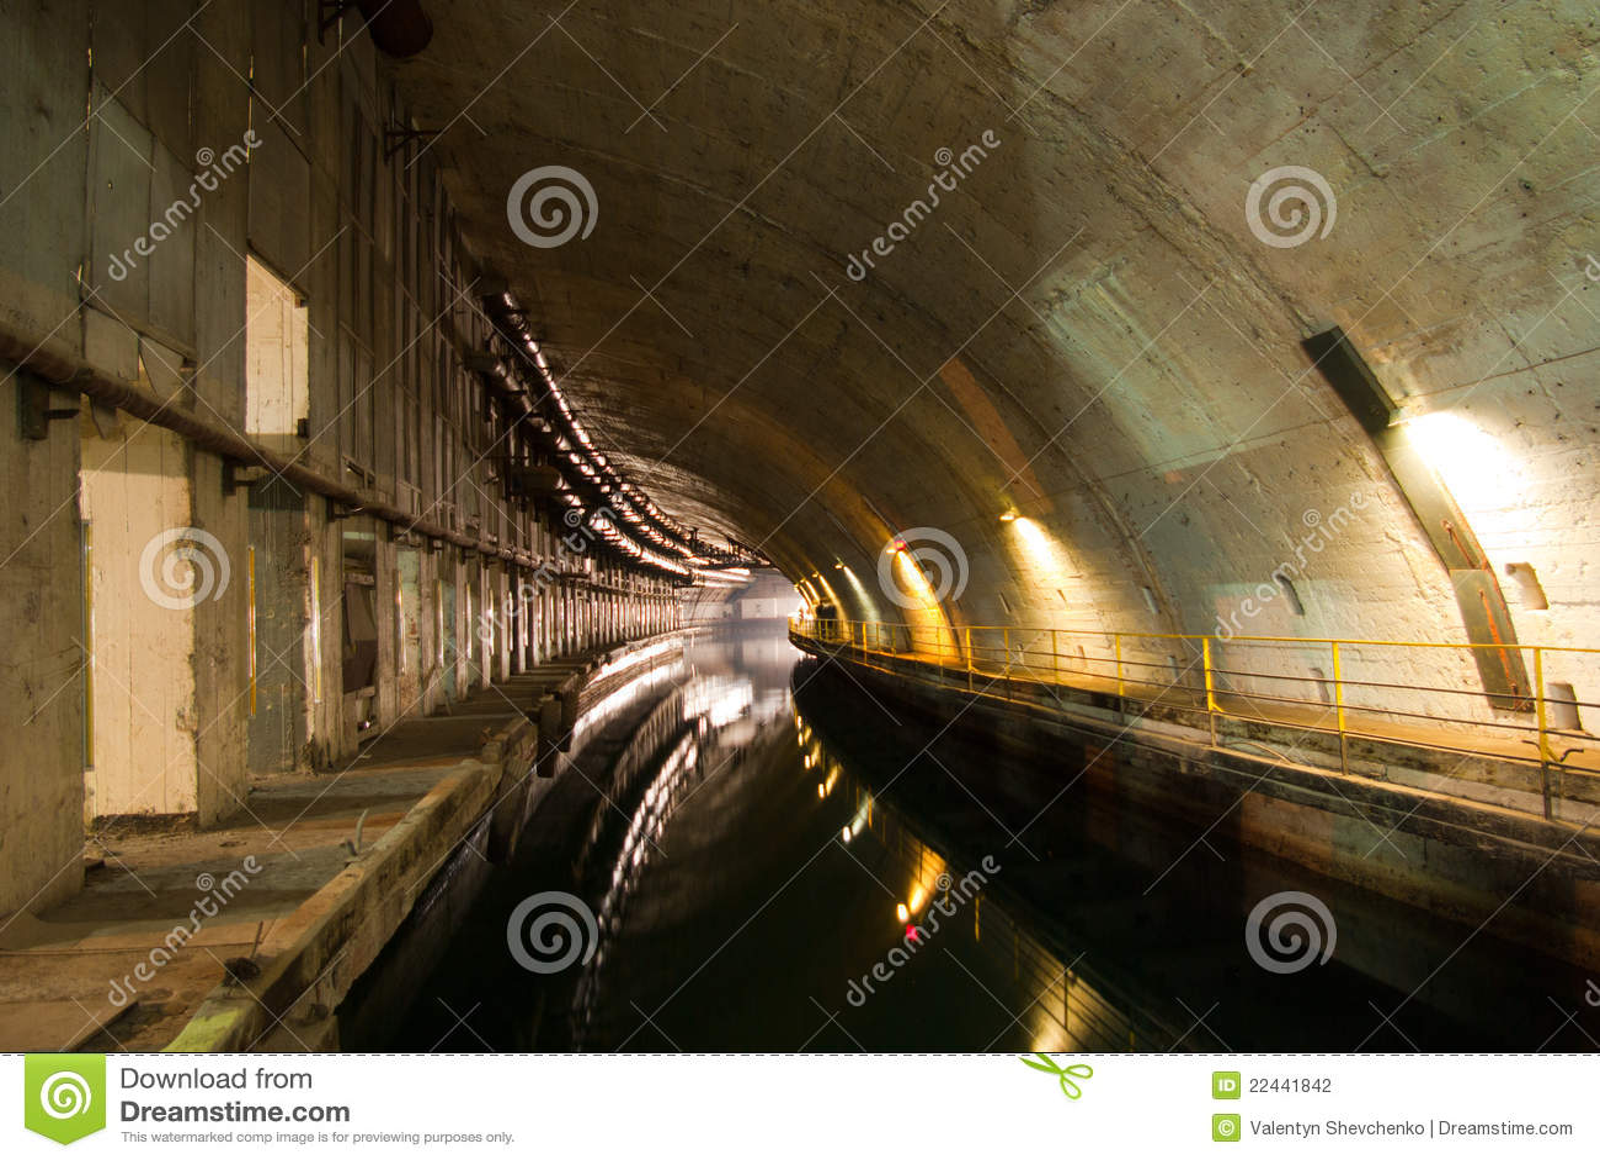 Dockage submarino militar do reparo